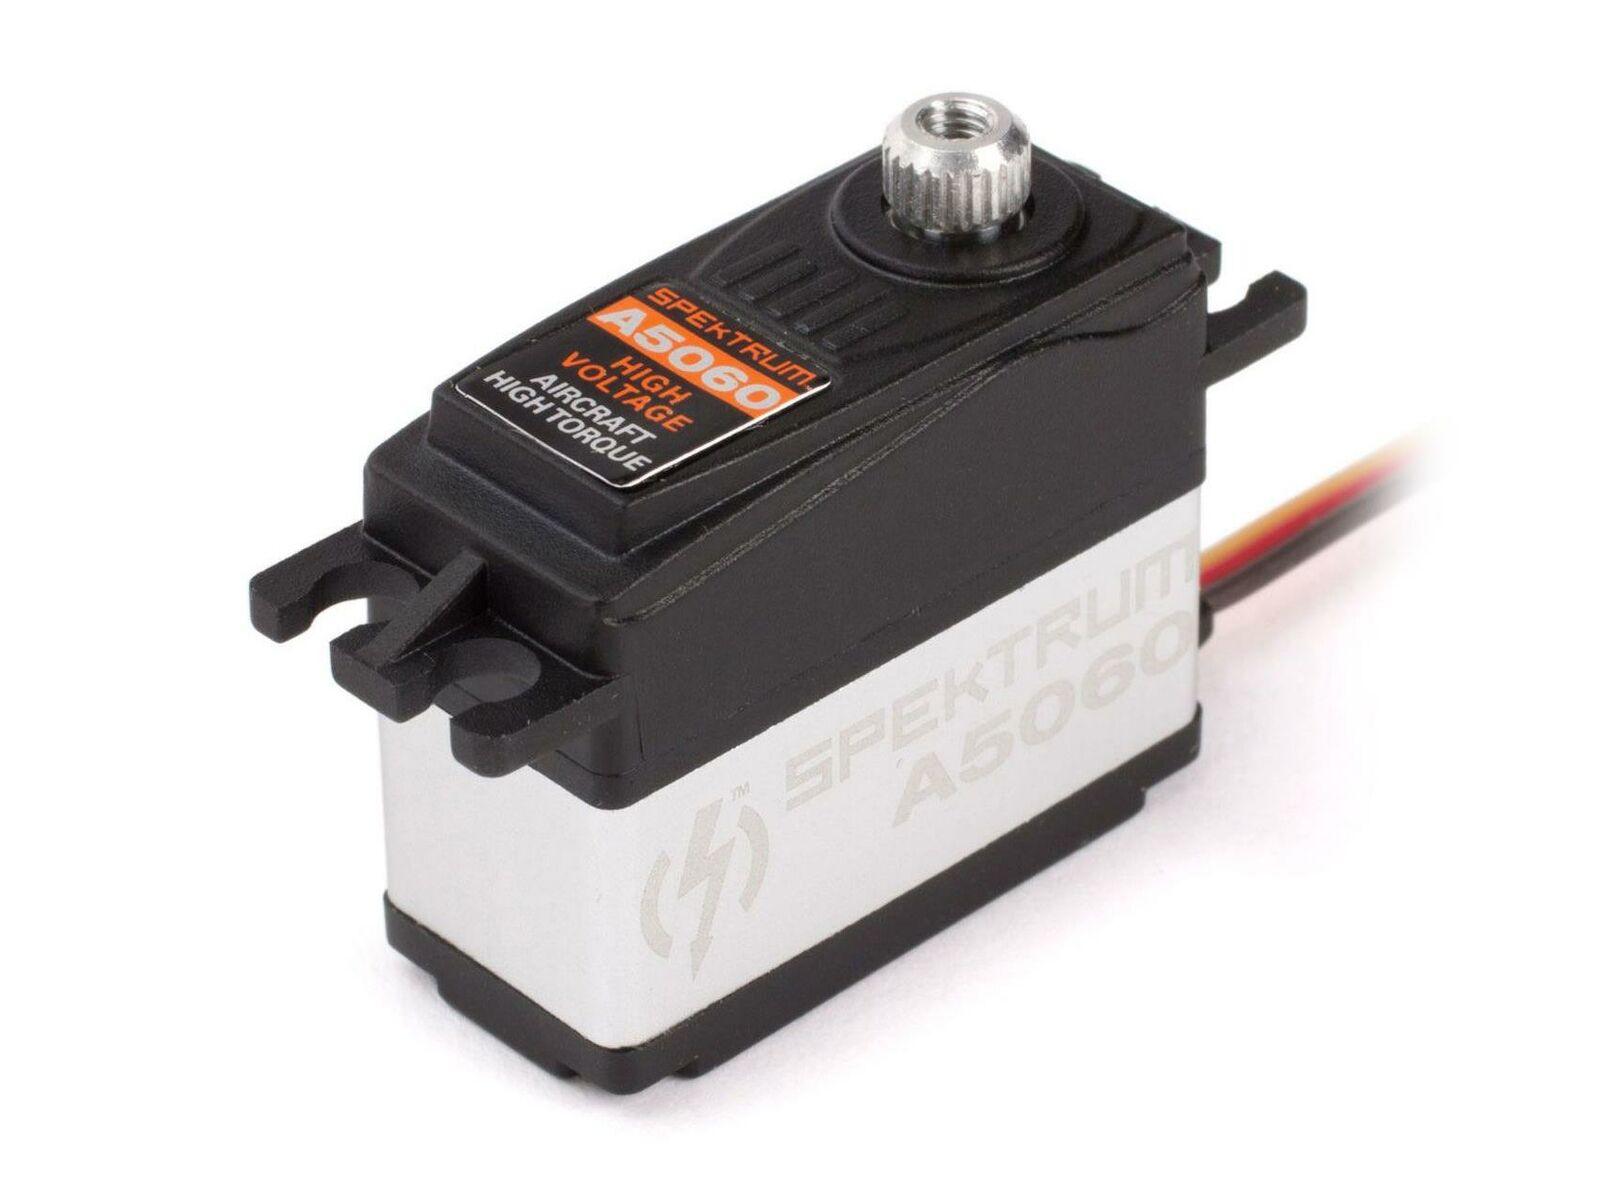 A5060 High Torque High Speed Mini Metal HV Servo P-SPMSA5060